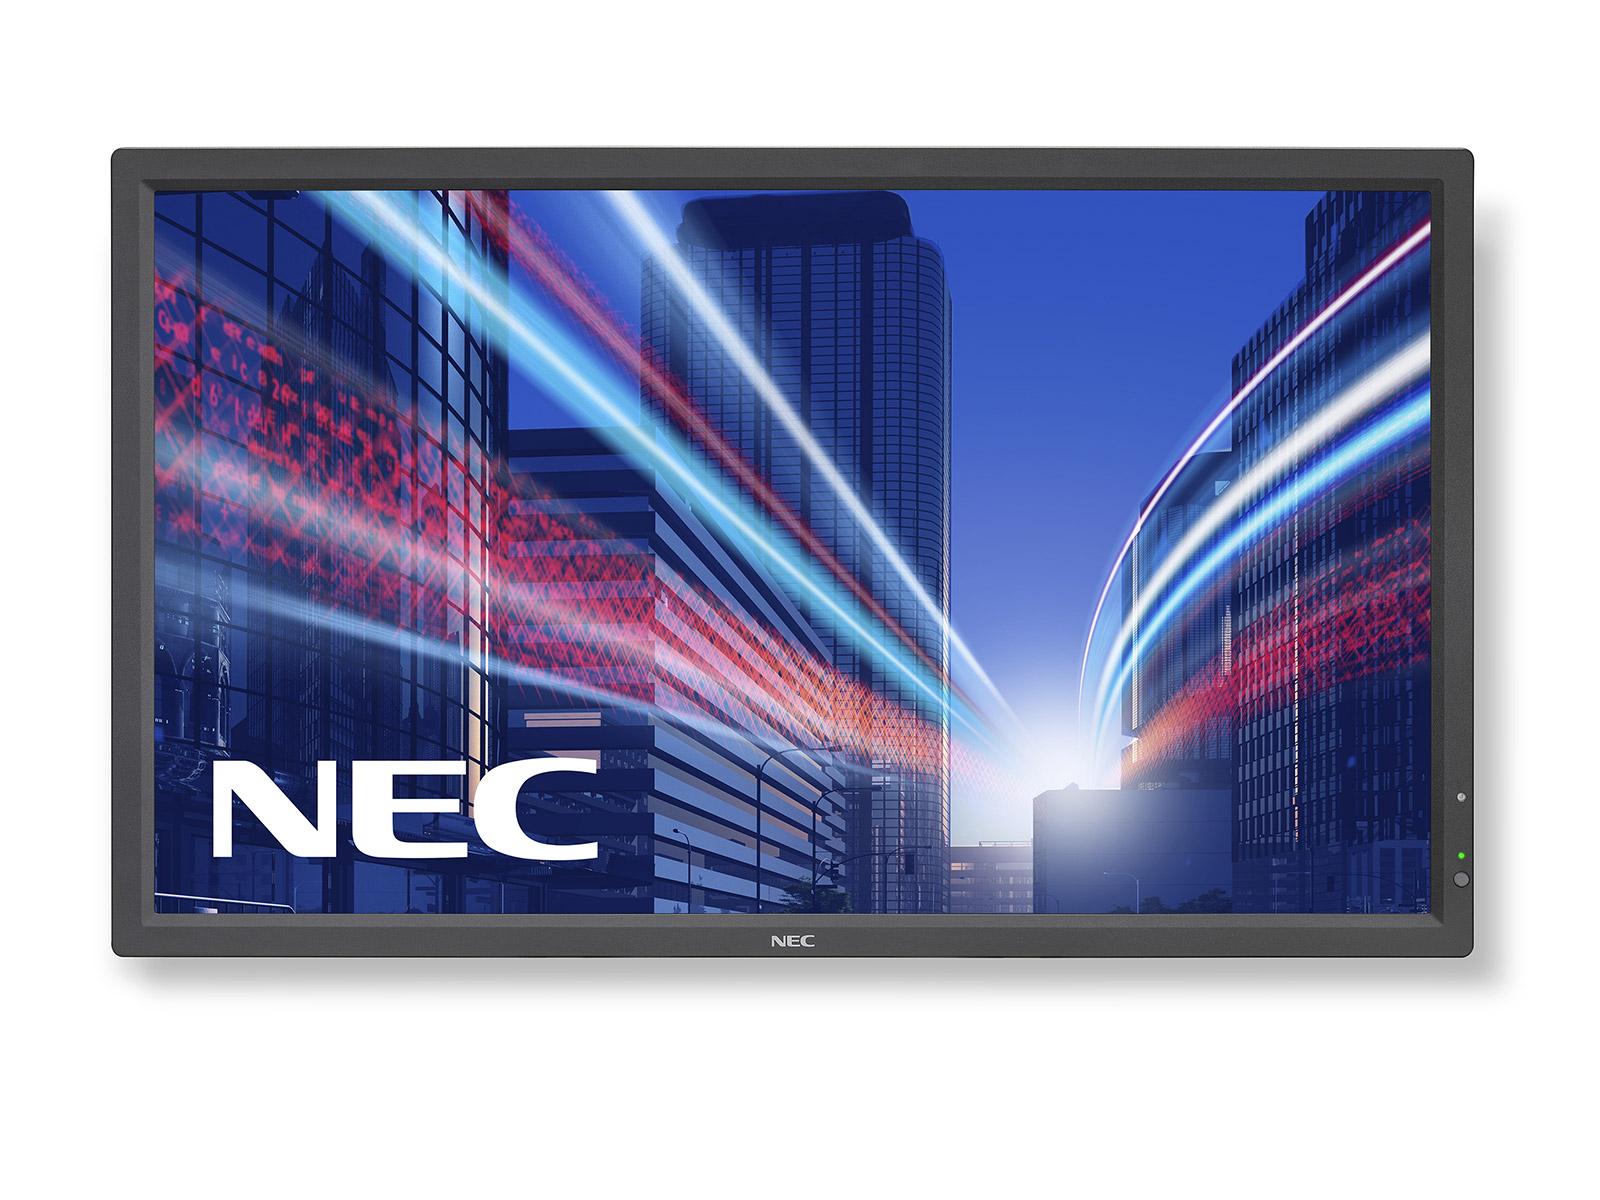 NEC V323 3 32in DIGITAL SIGNAGE